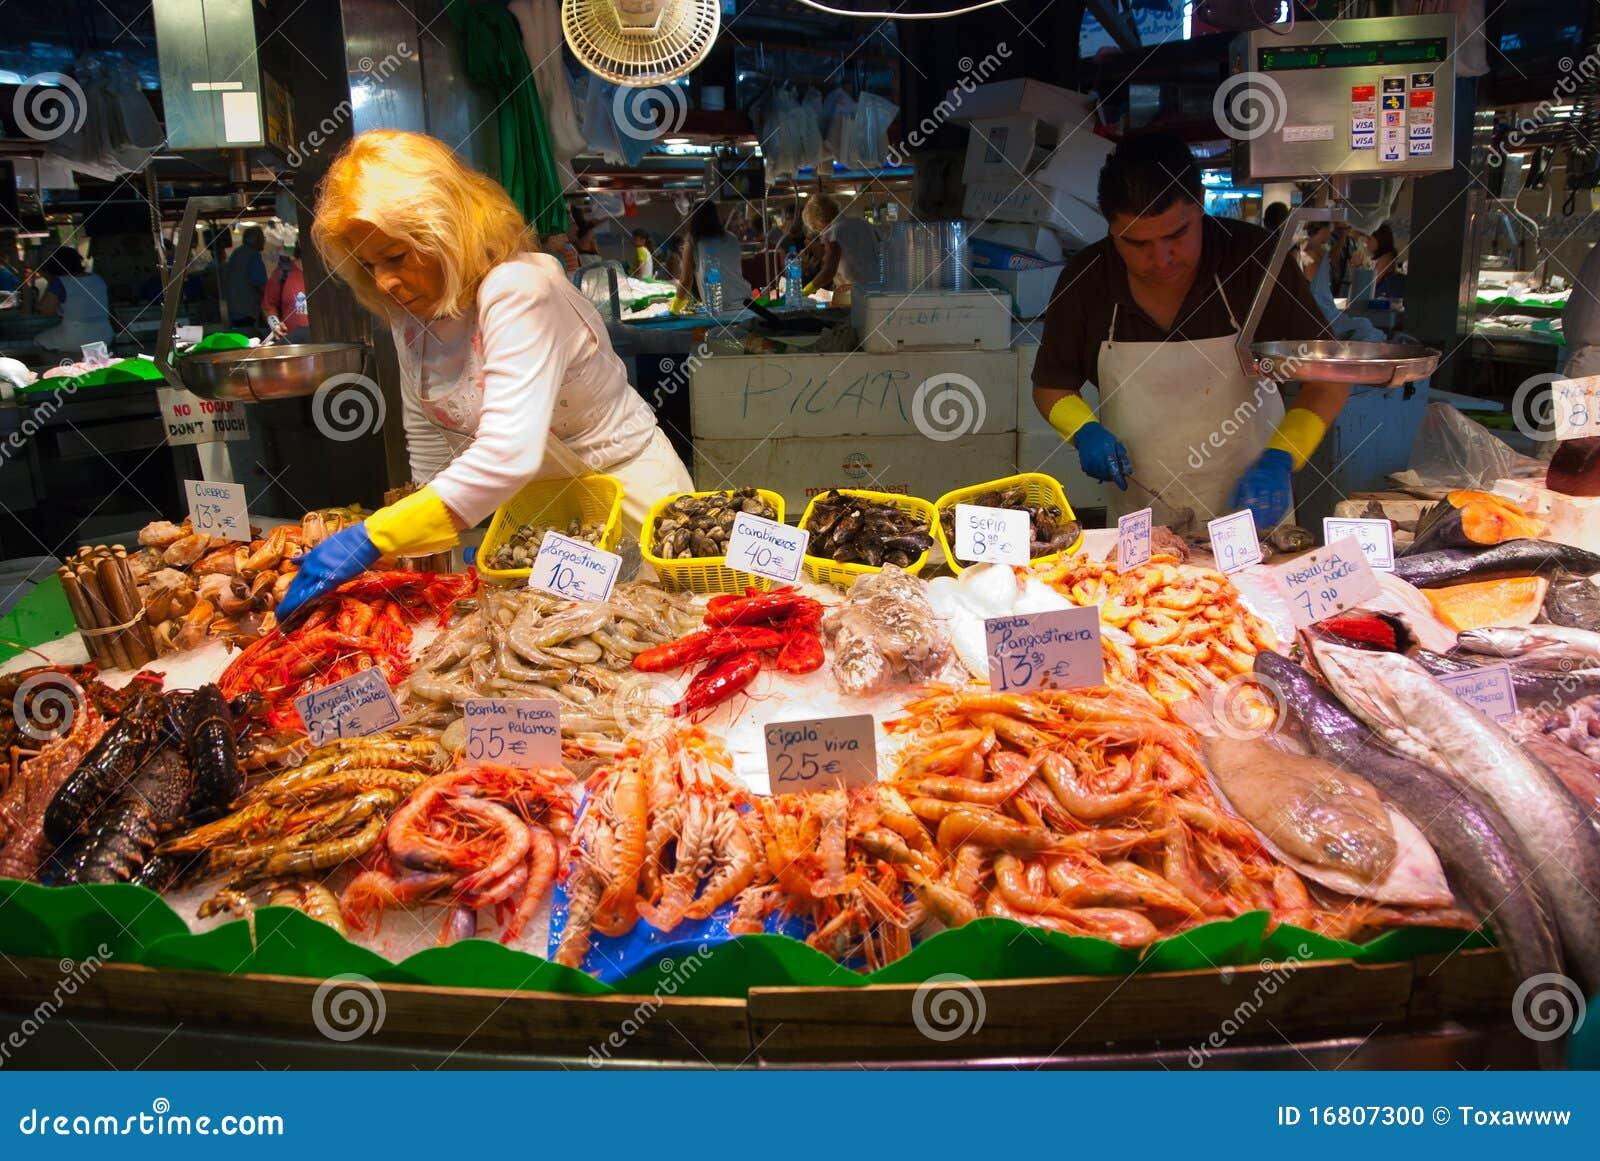 Fish shop in la boqueria market editorial image image of for La fish market